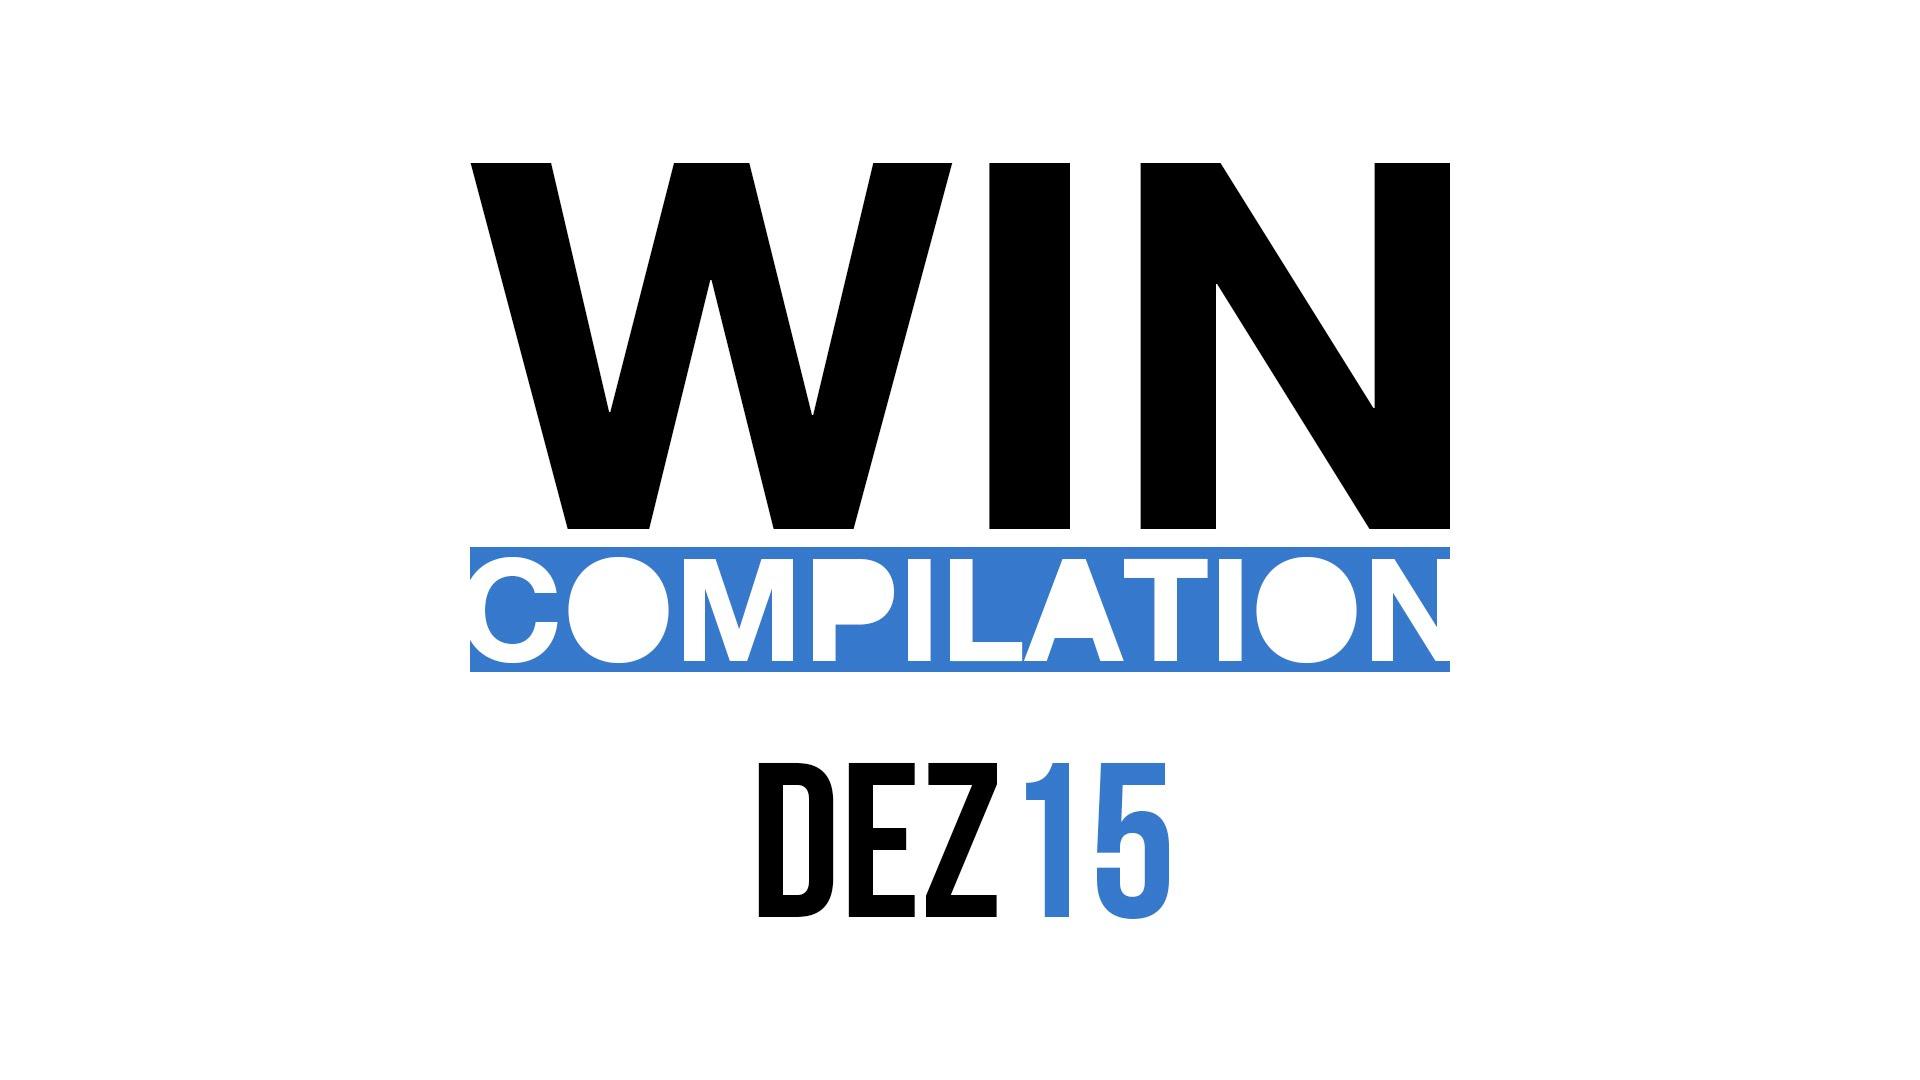 Win-Compilation December 2015